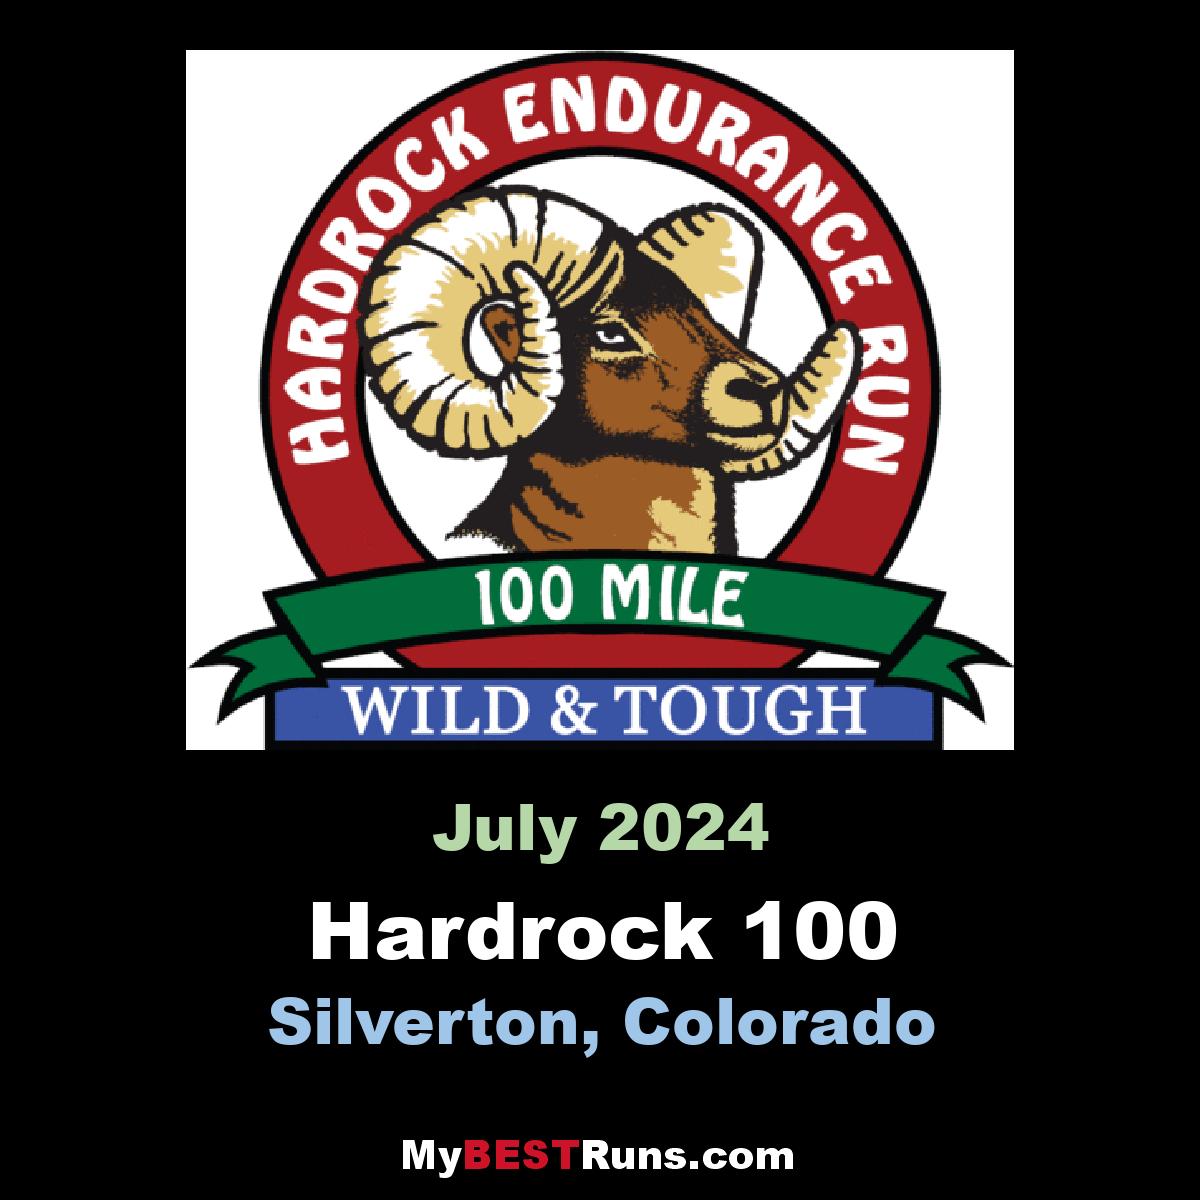 Hardrock 100